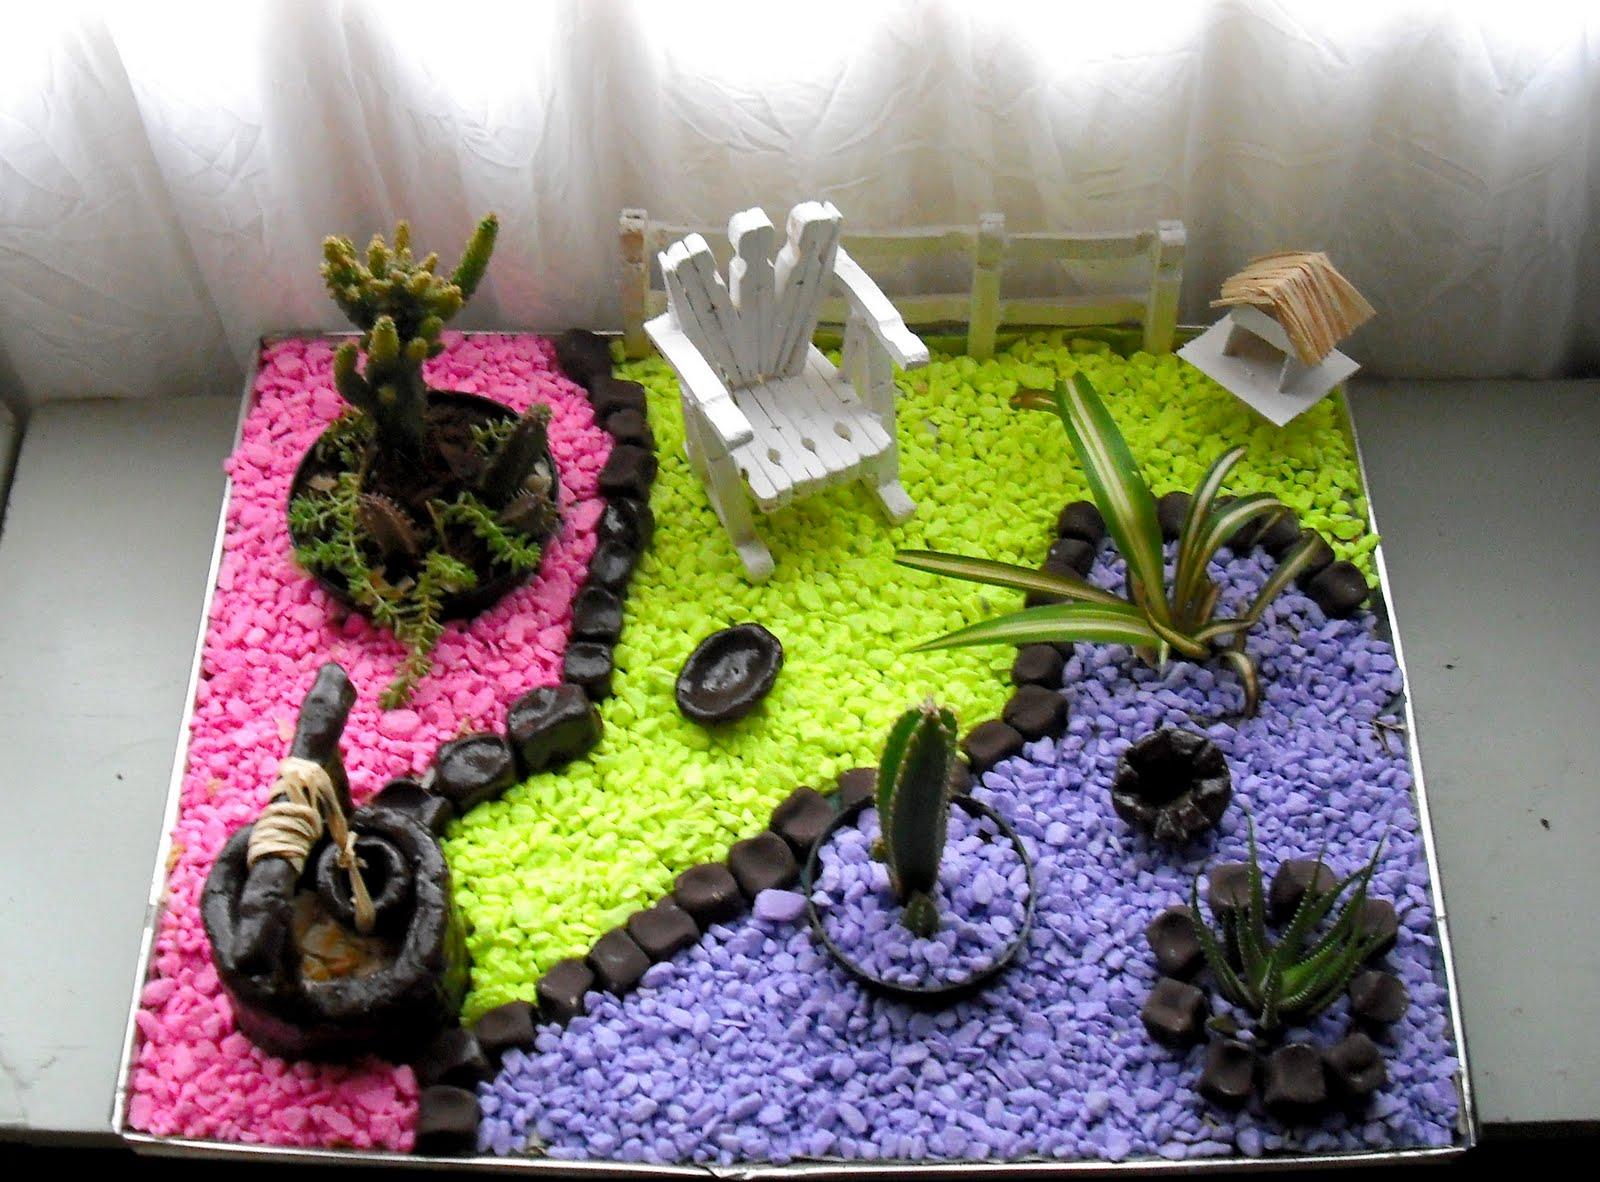 artesanato mini jardim : artesanato mini jardim:Artesanato e dicas: MINI JARDIM